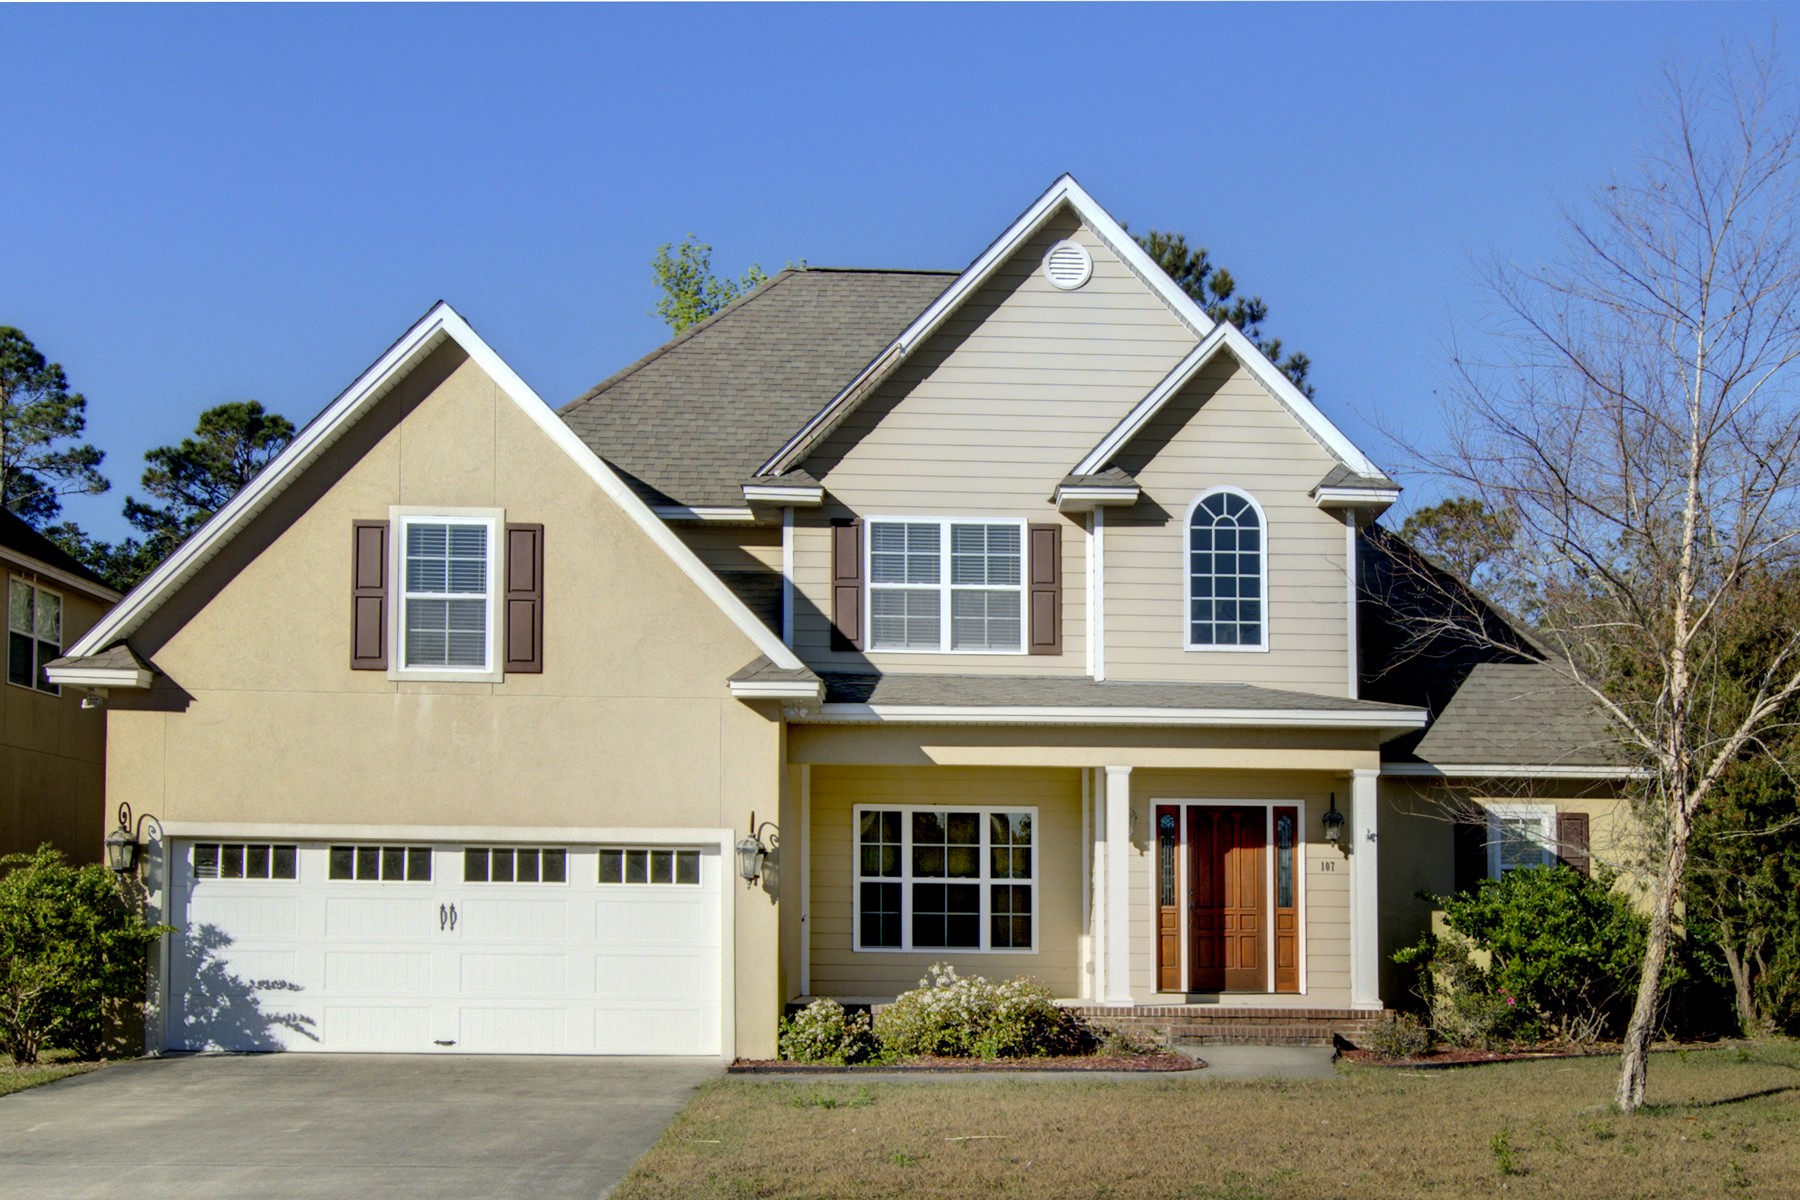 Single Family Home for Sale at 107 Maderia 107 Maderia Drive Brunswick, Georgia 31523 United States